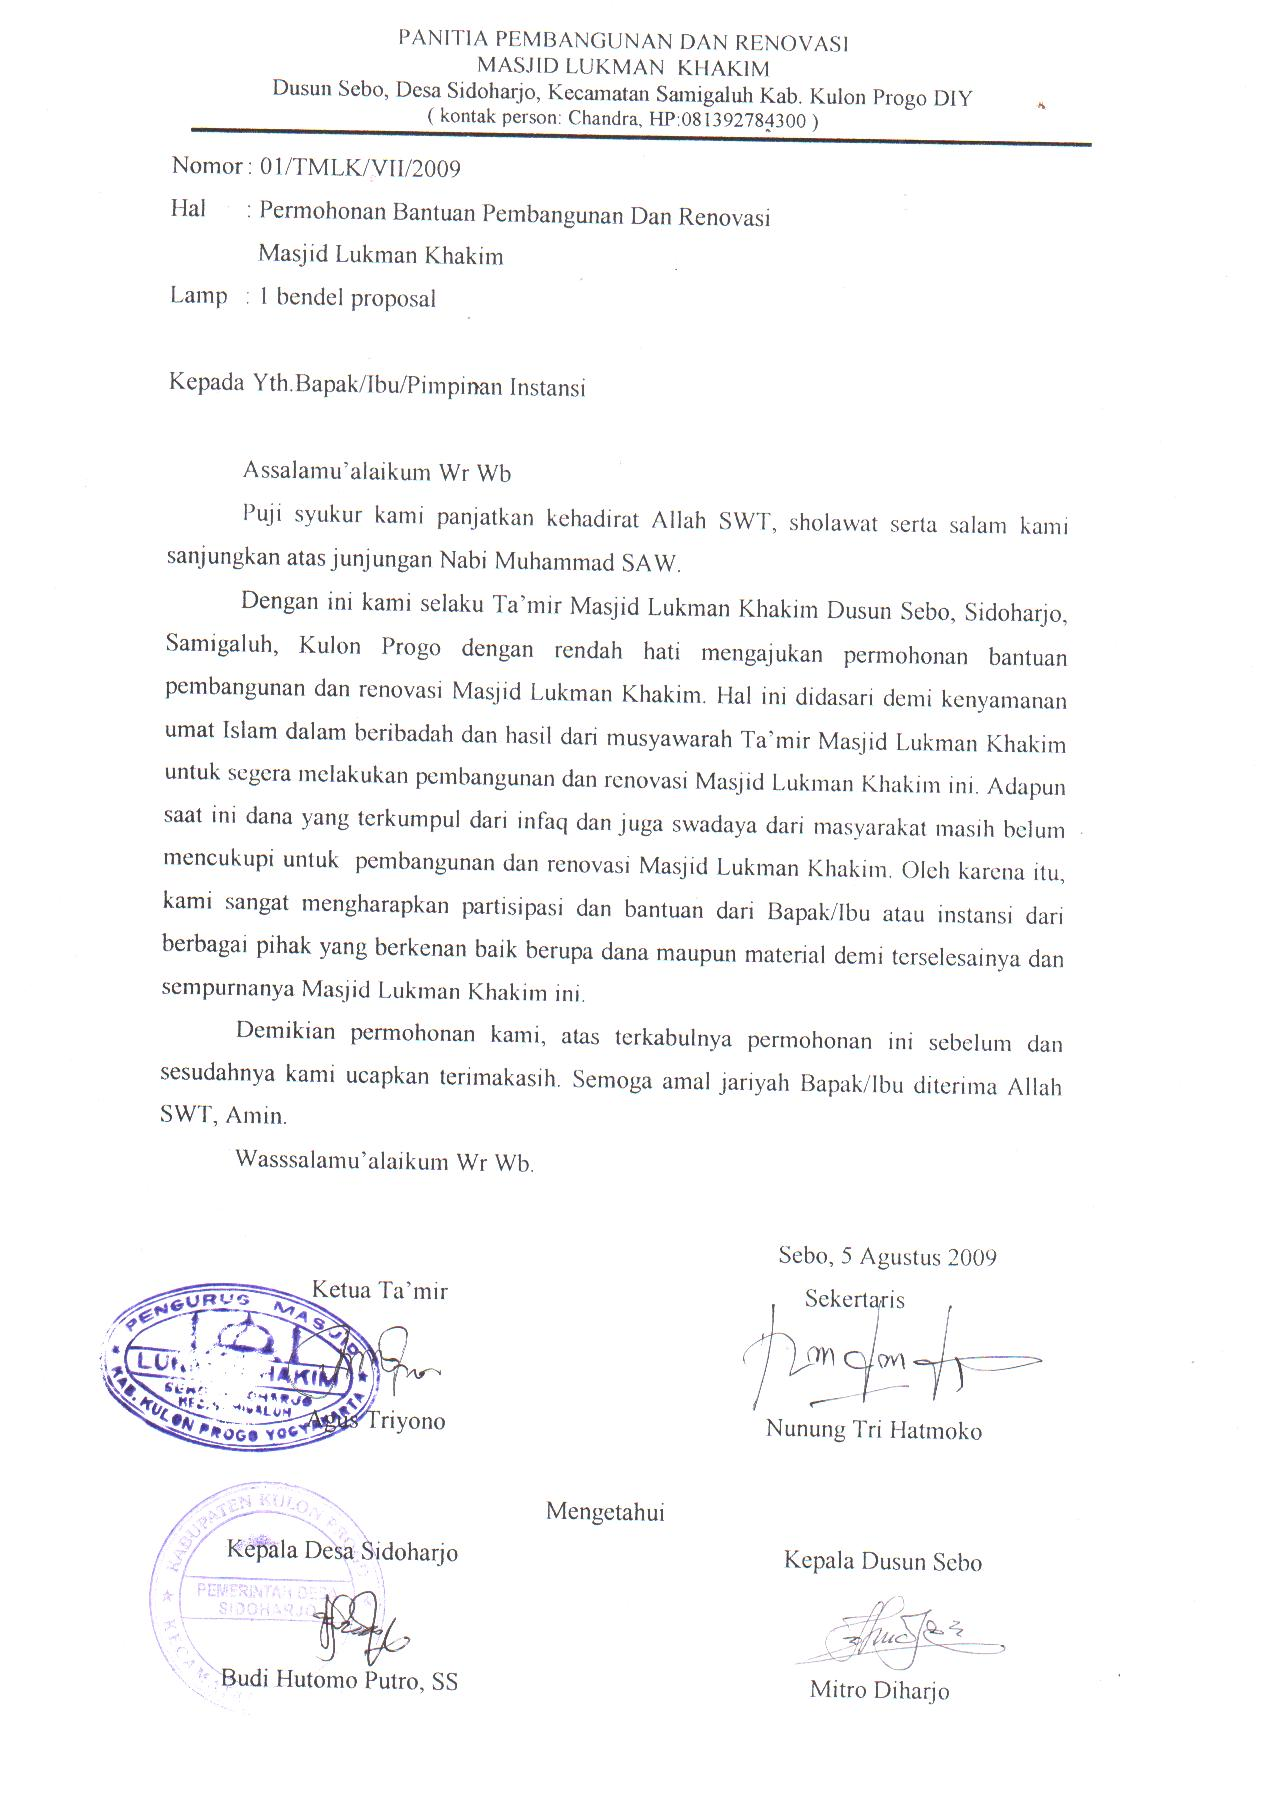 Surat Pengantar dari Kepala Desa